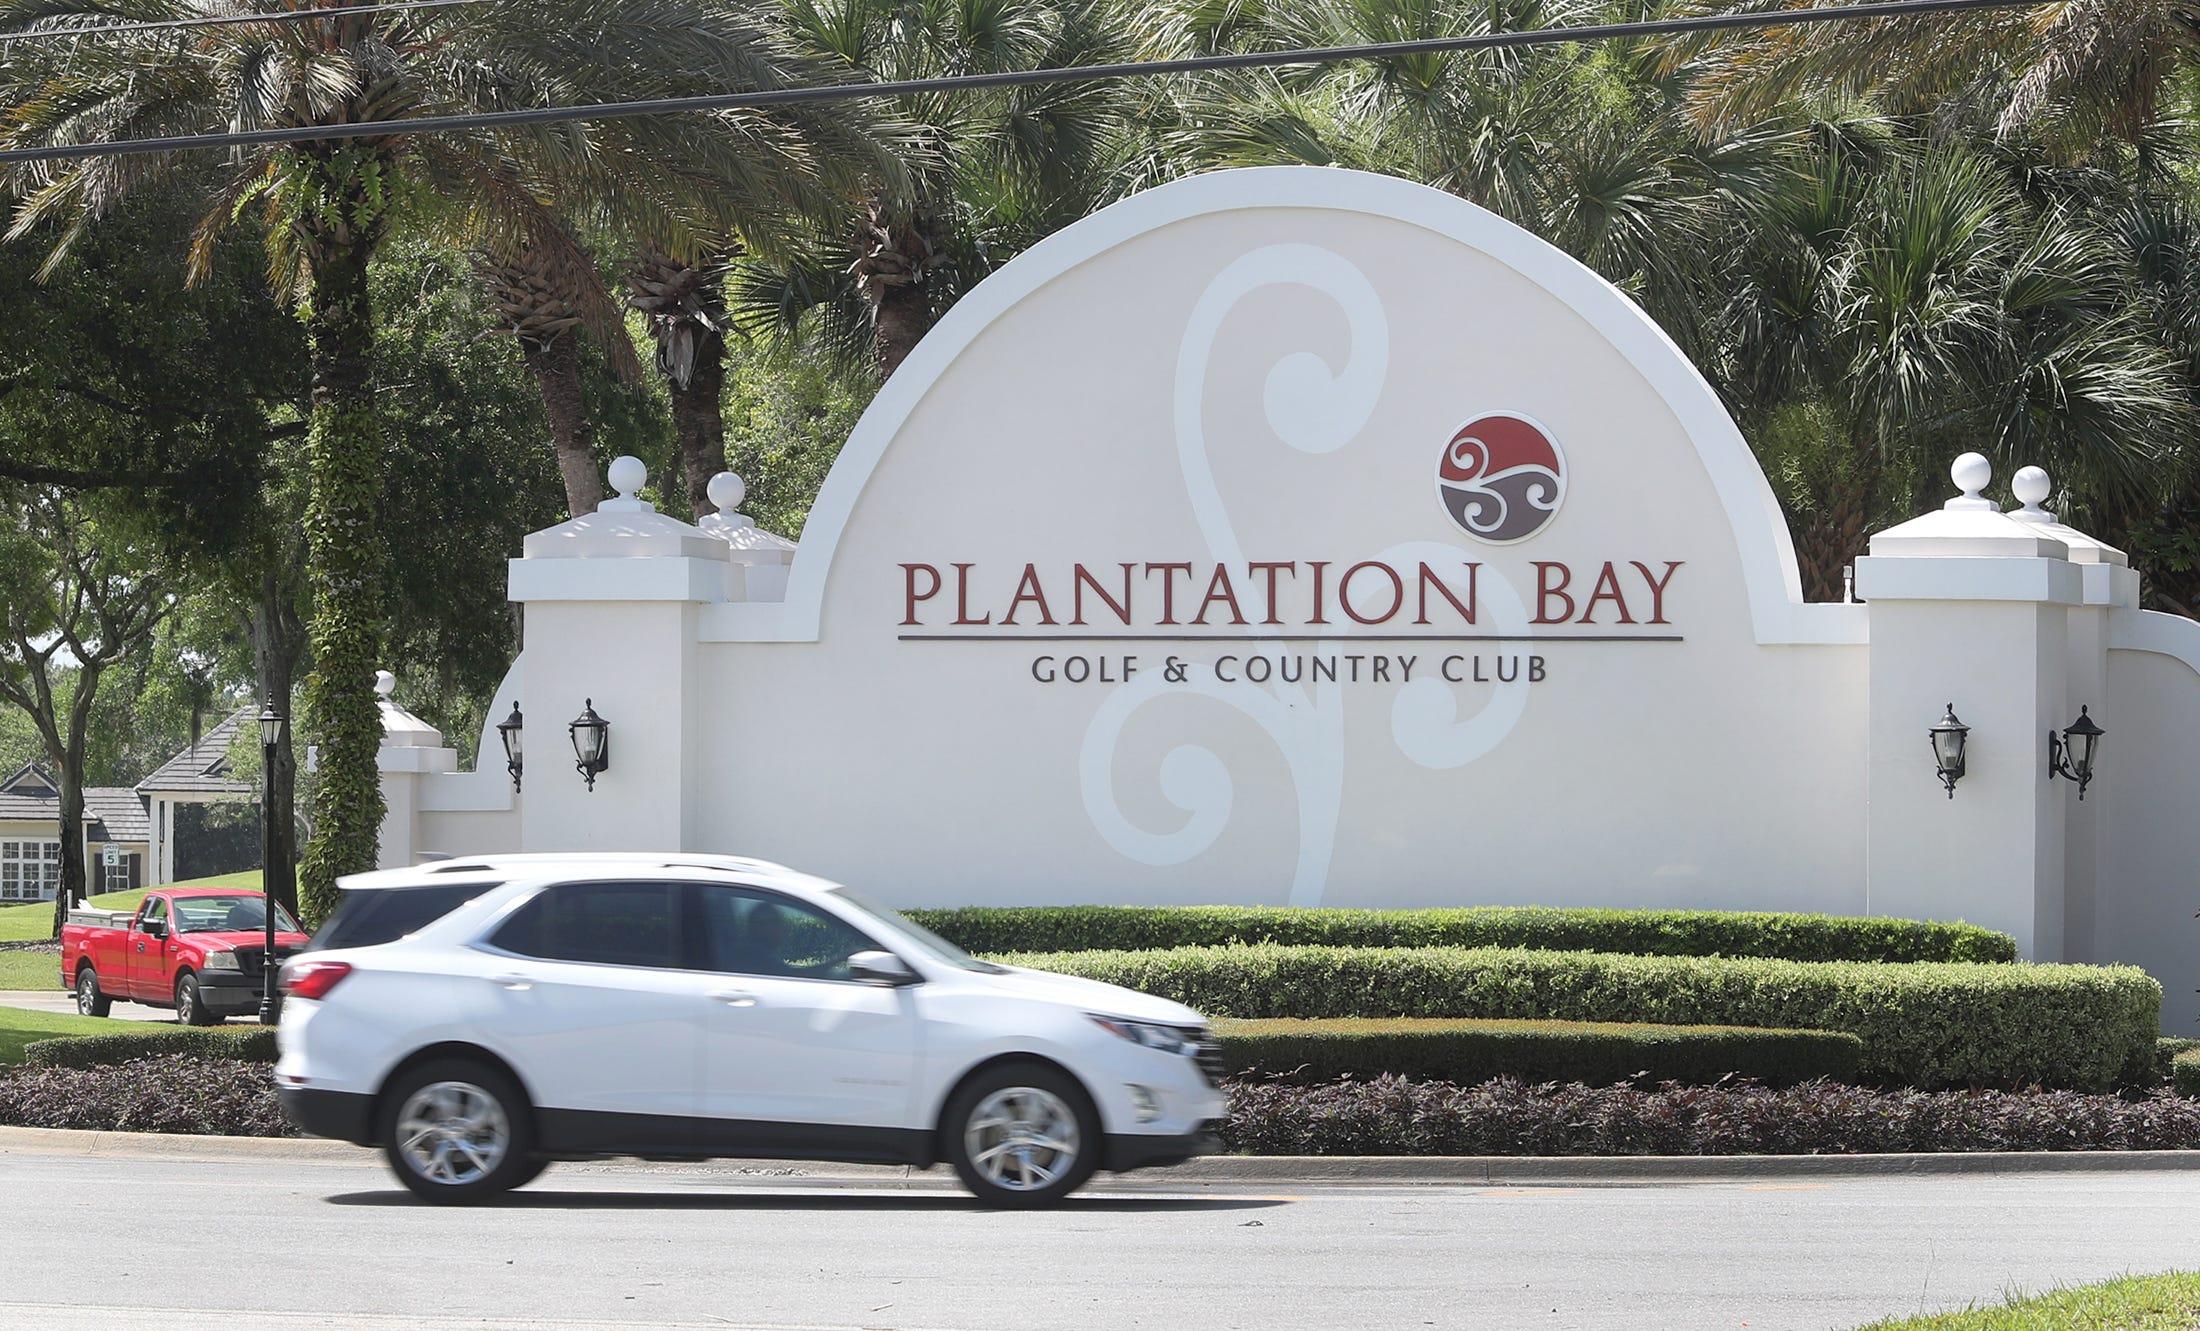 Real-estate developers won t rename  plantation  properties in South Carolina, Florida